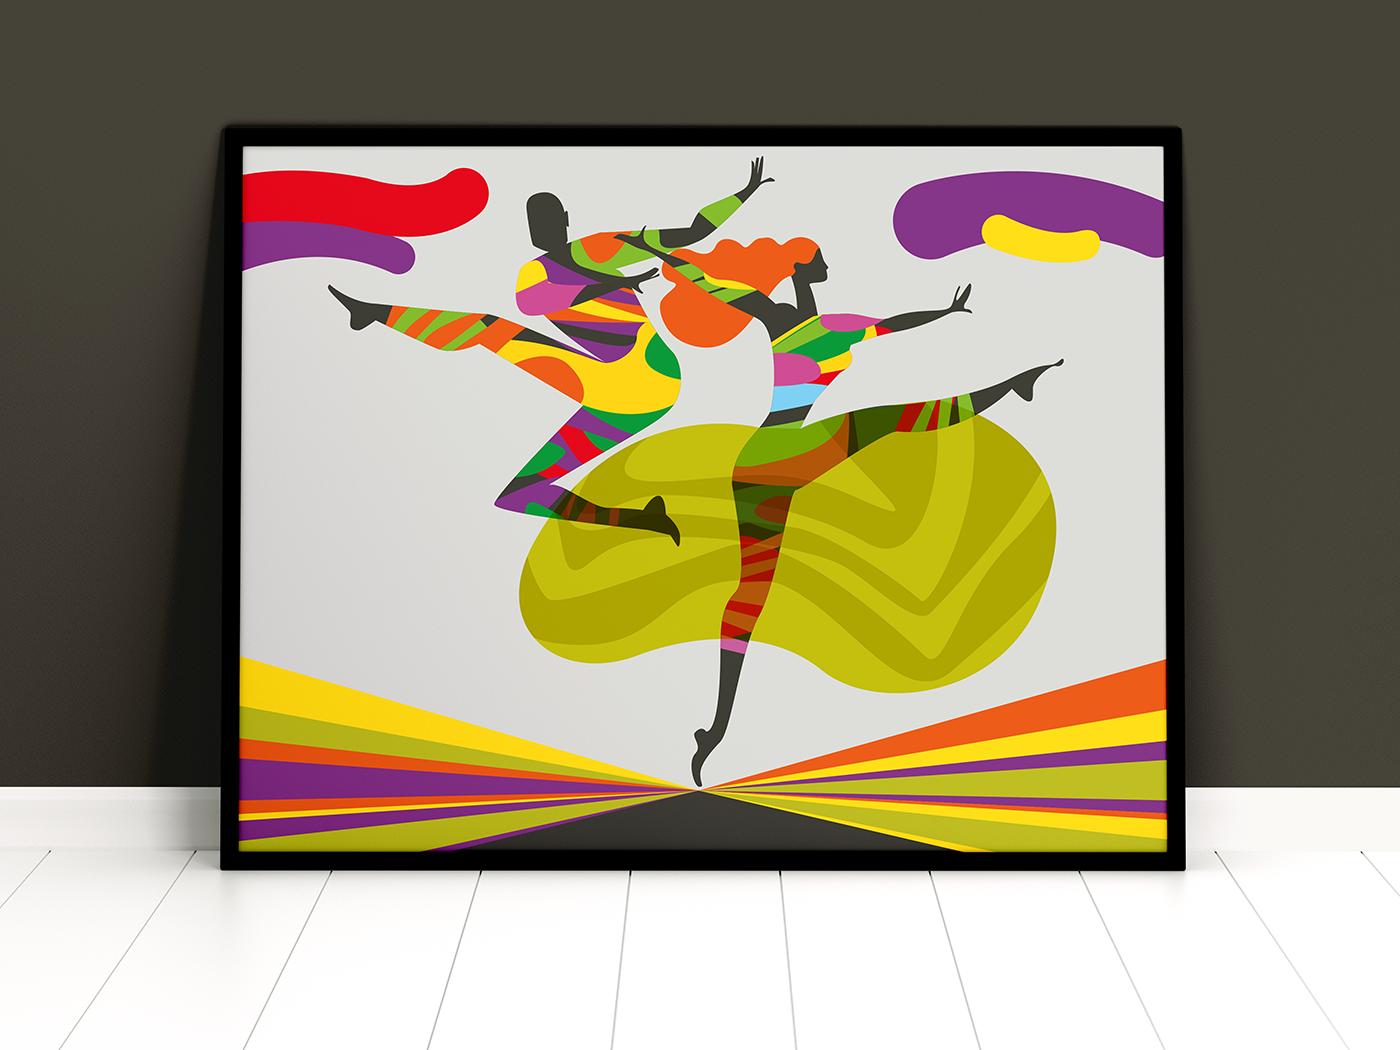 conceptual concettuale flat Illustrator Vectorial vettoriale